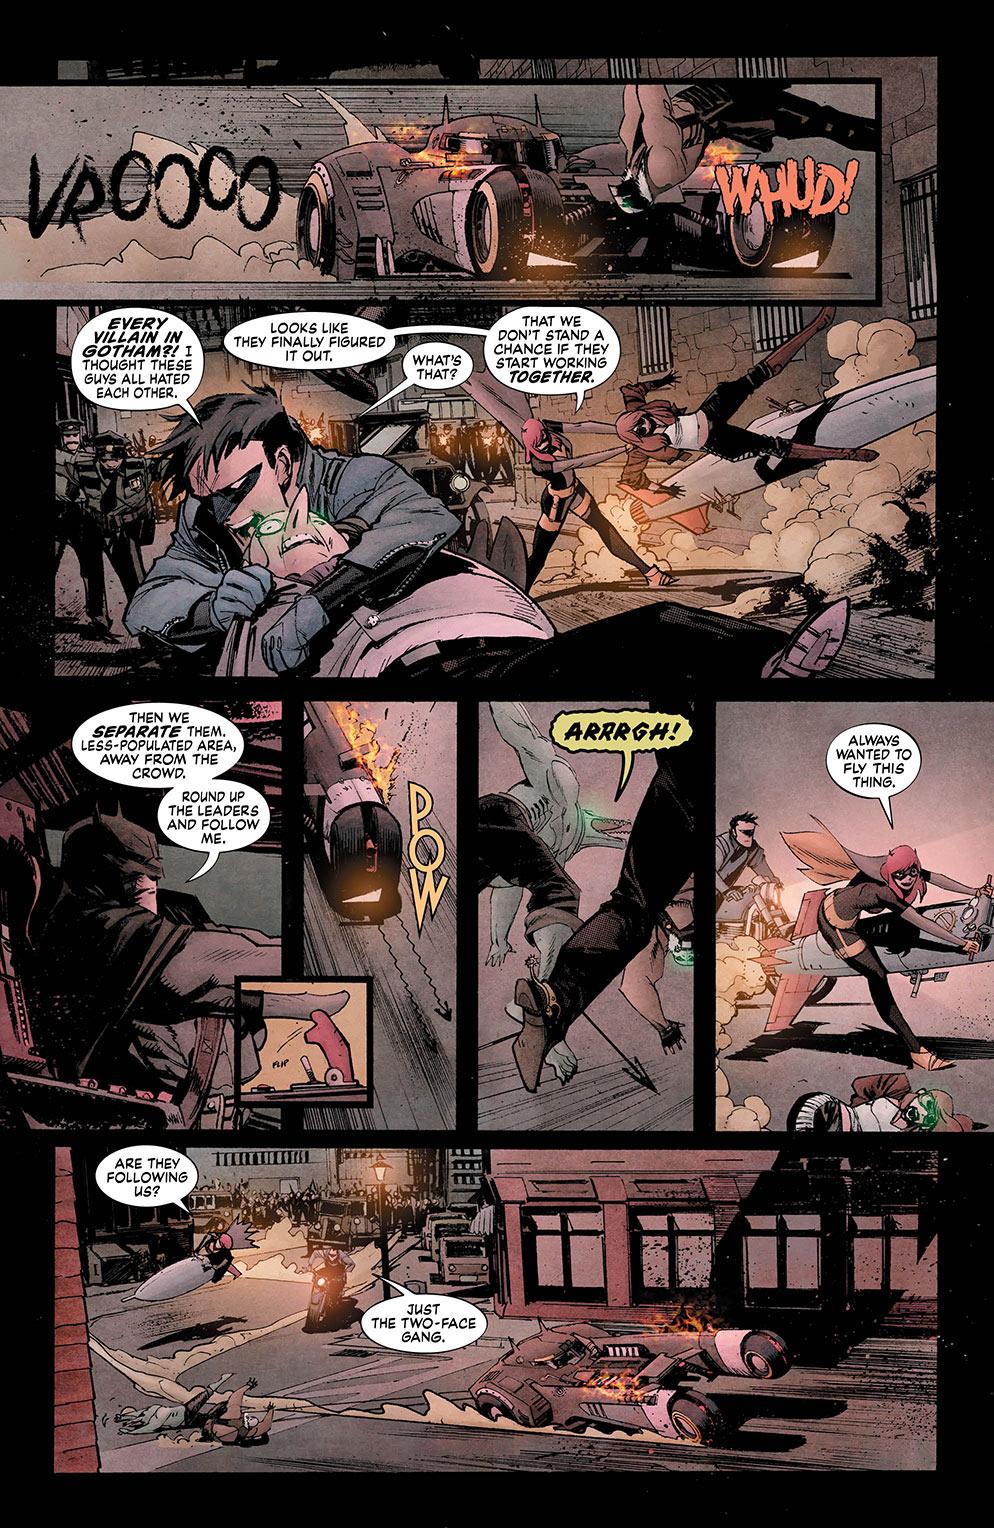 Batman White Knight 3_4 - DC Comics News